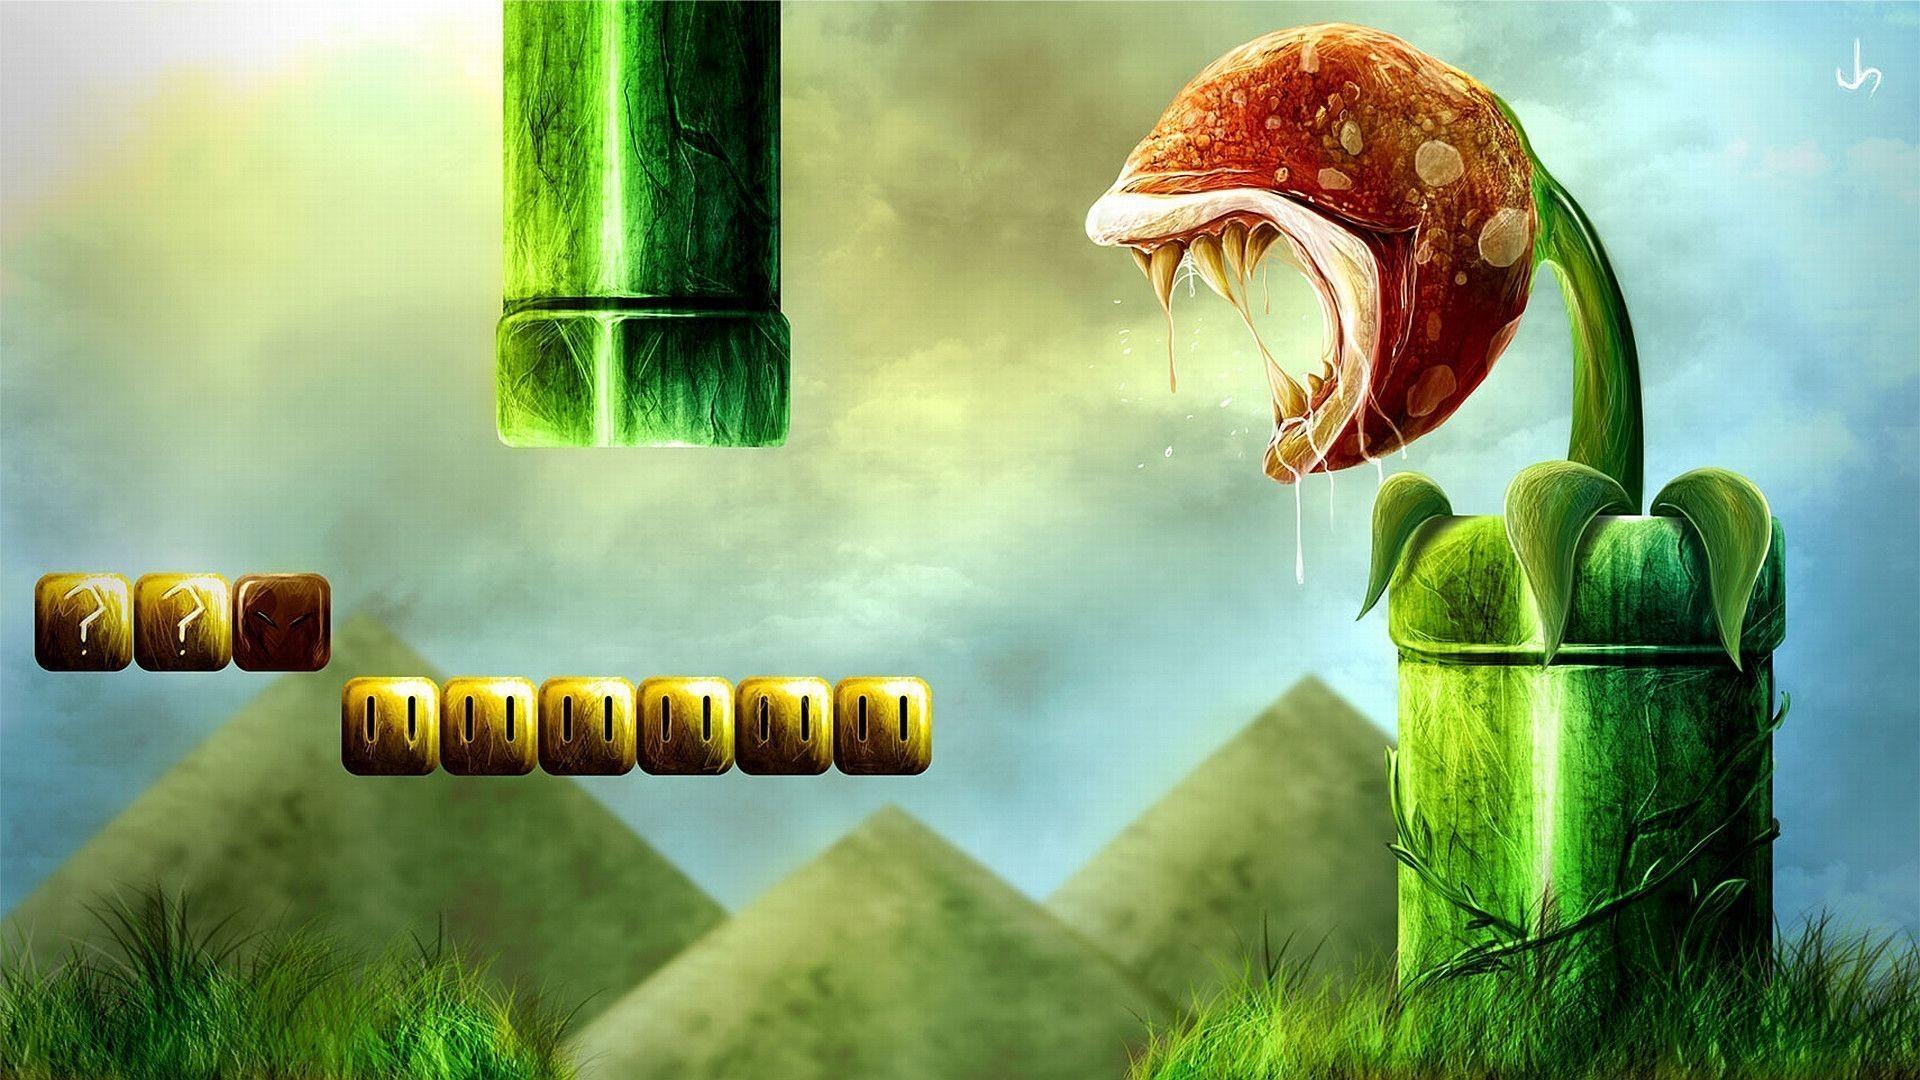 Video Game Desktop Backgrounds – Wallpaper Cave